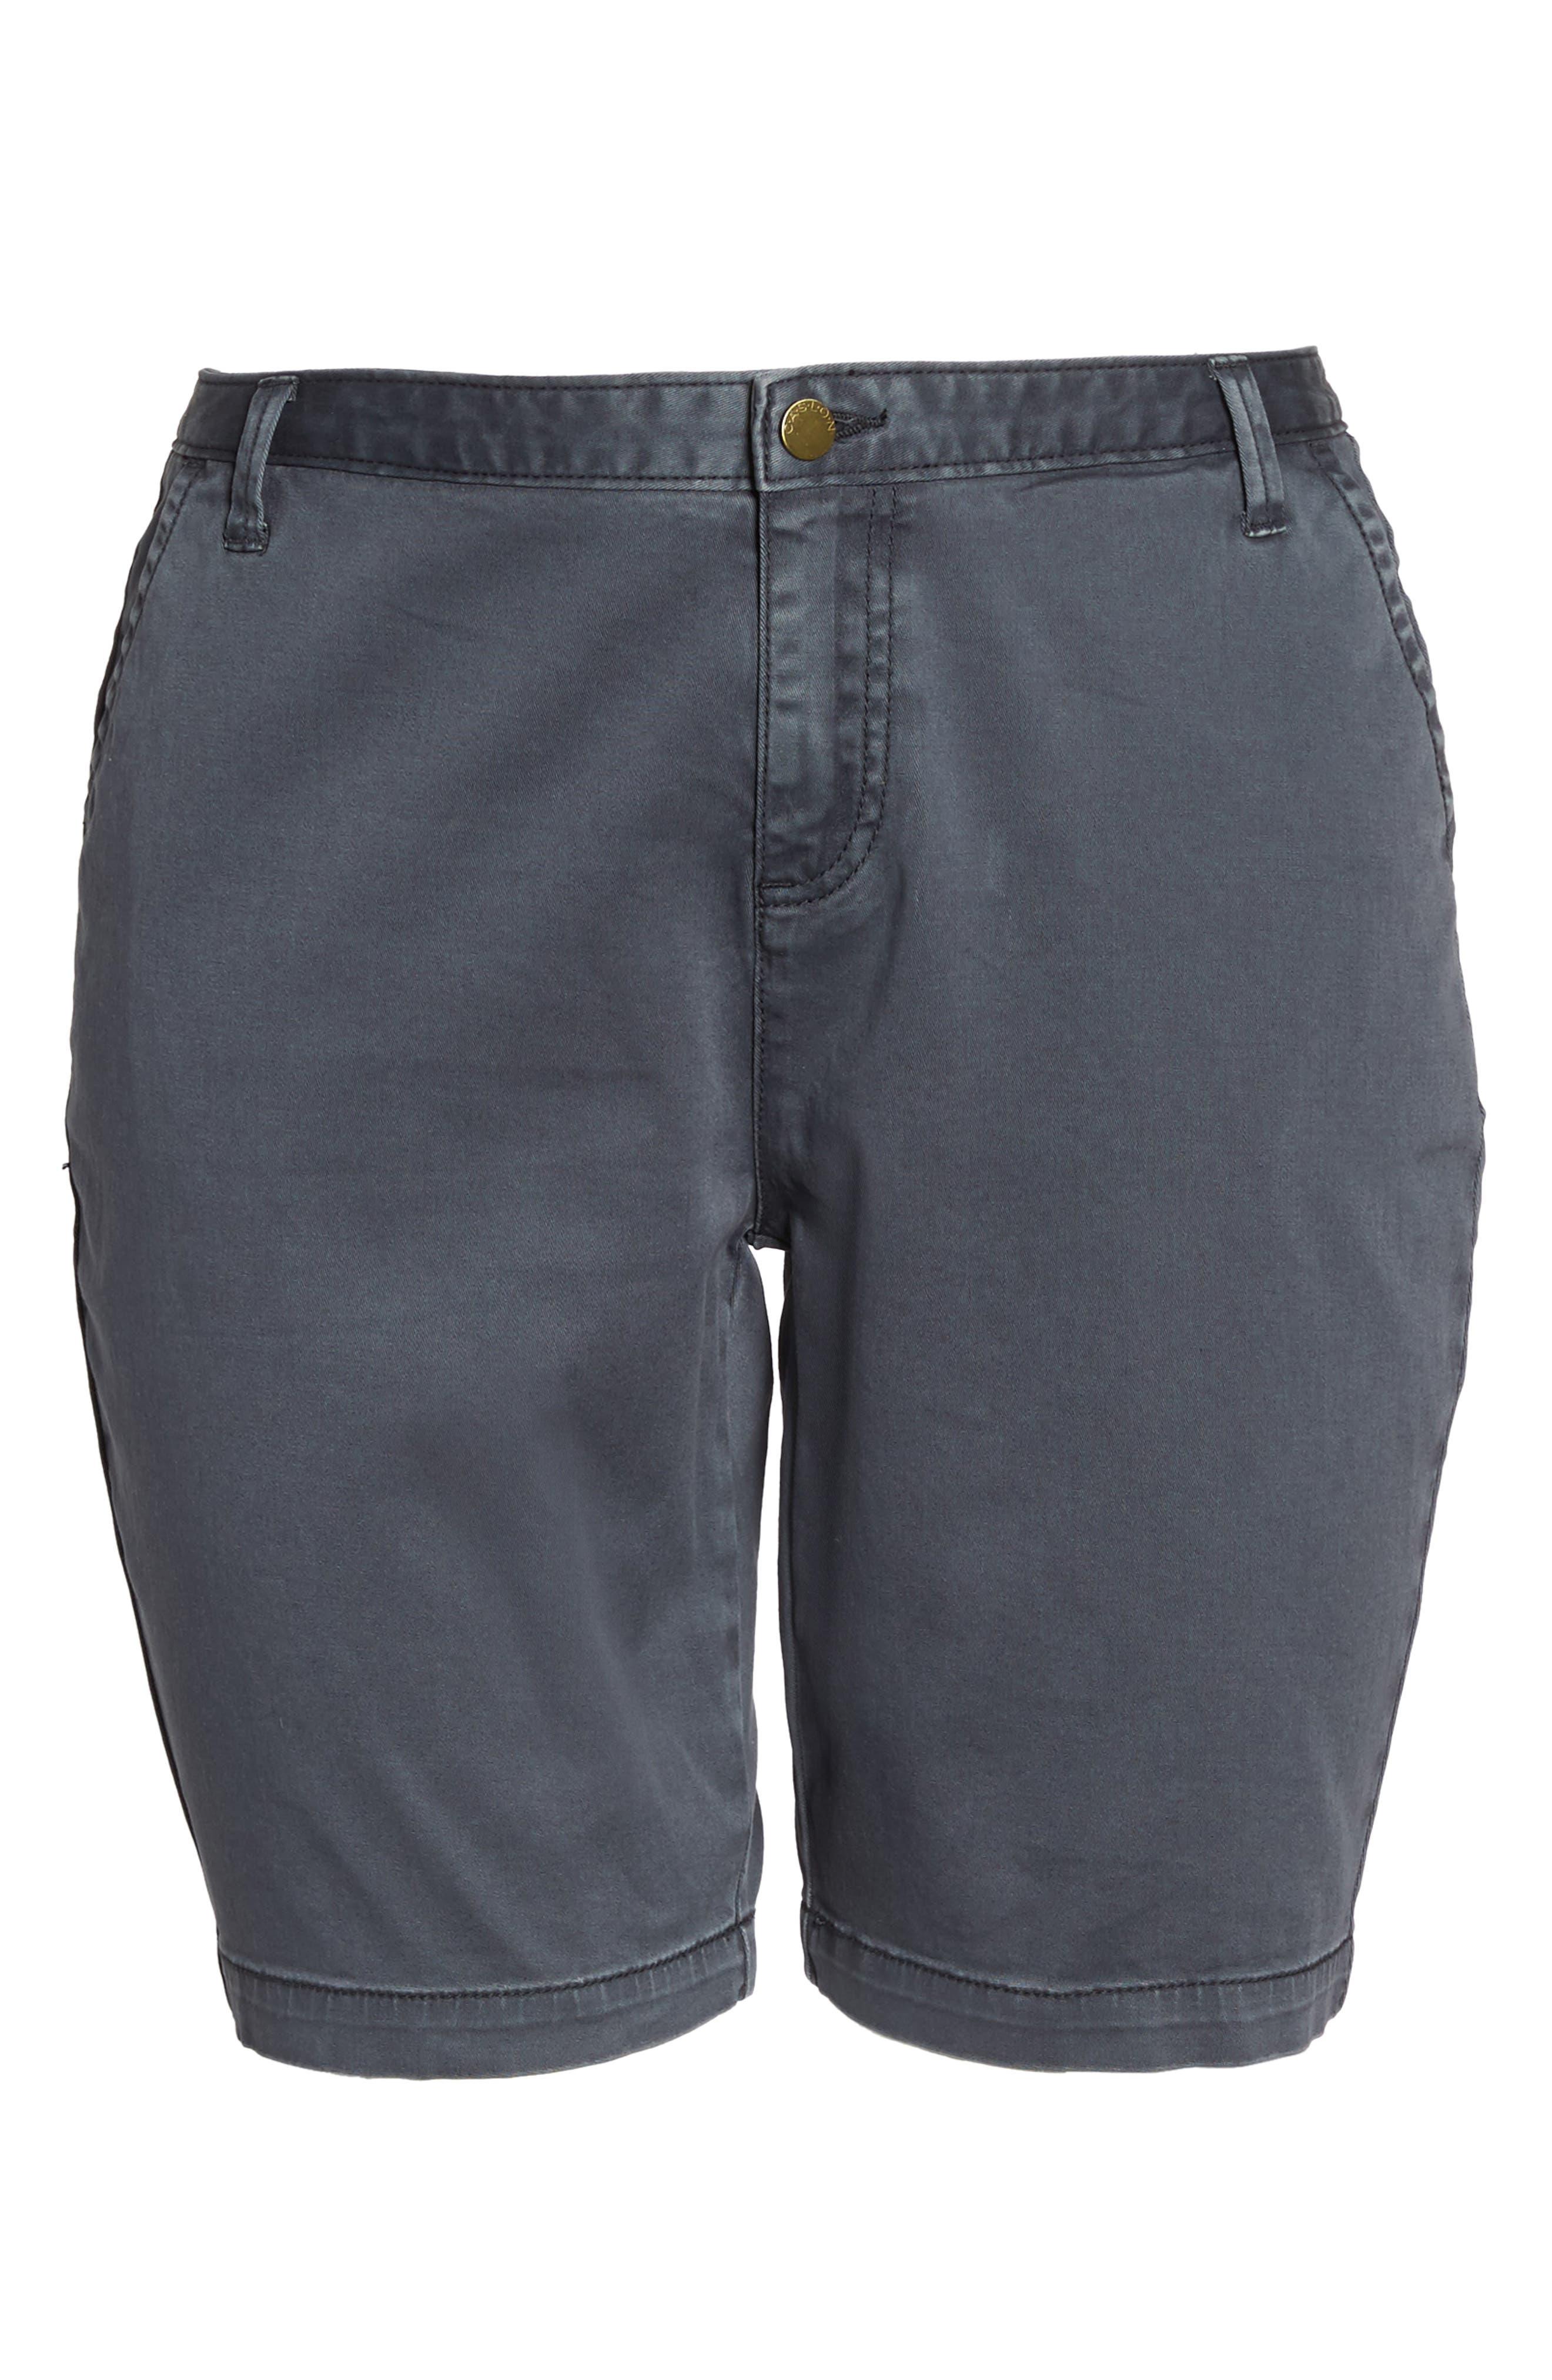 Twill Shorts,                             Alternate thumbnail 7, color,                             030